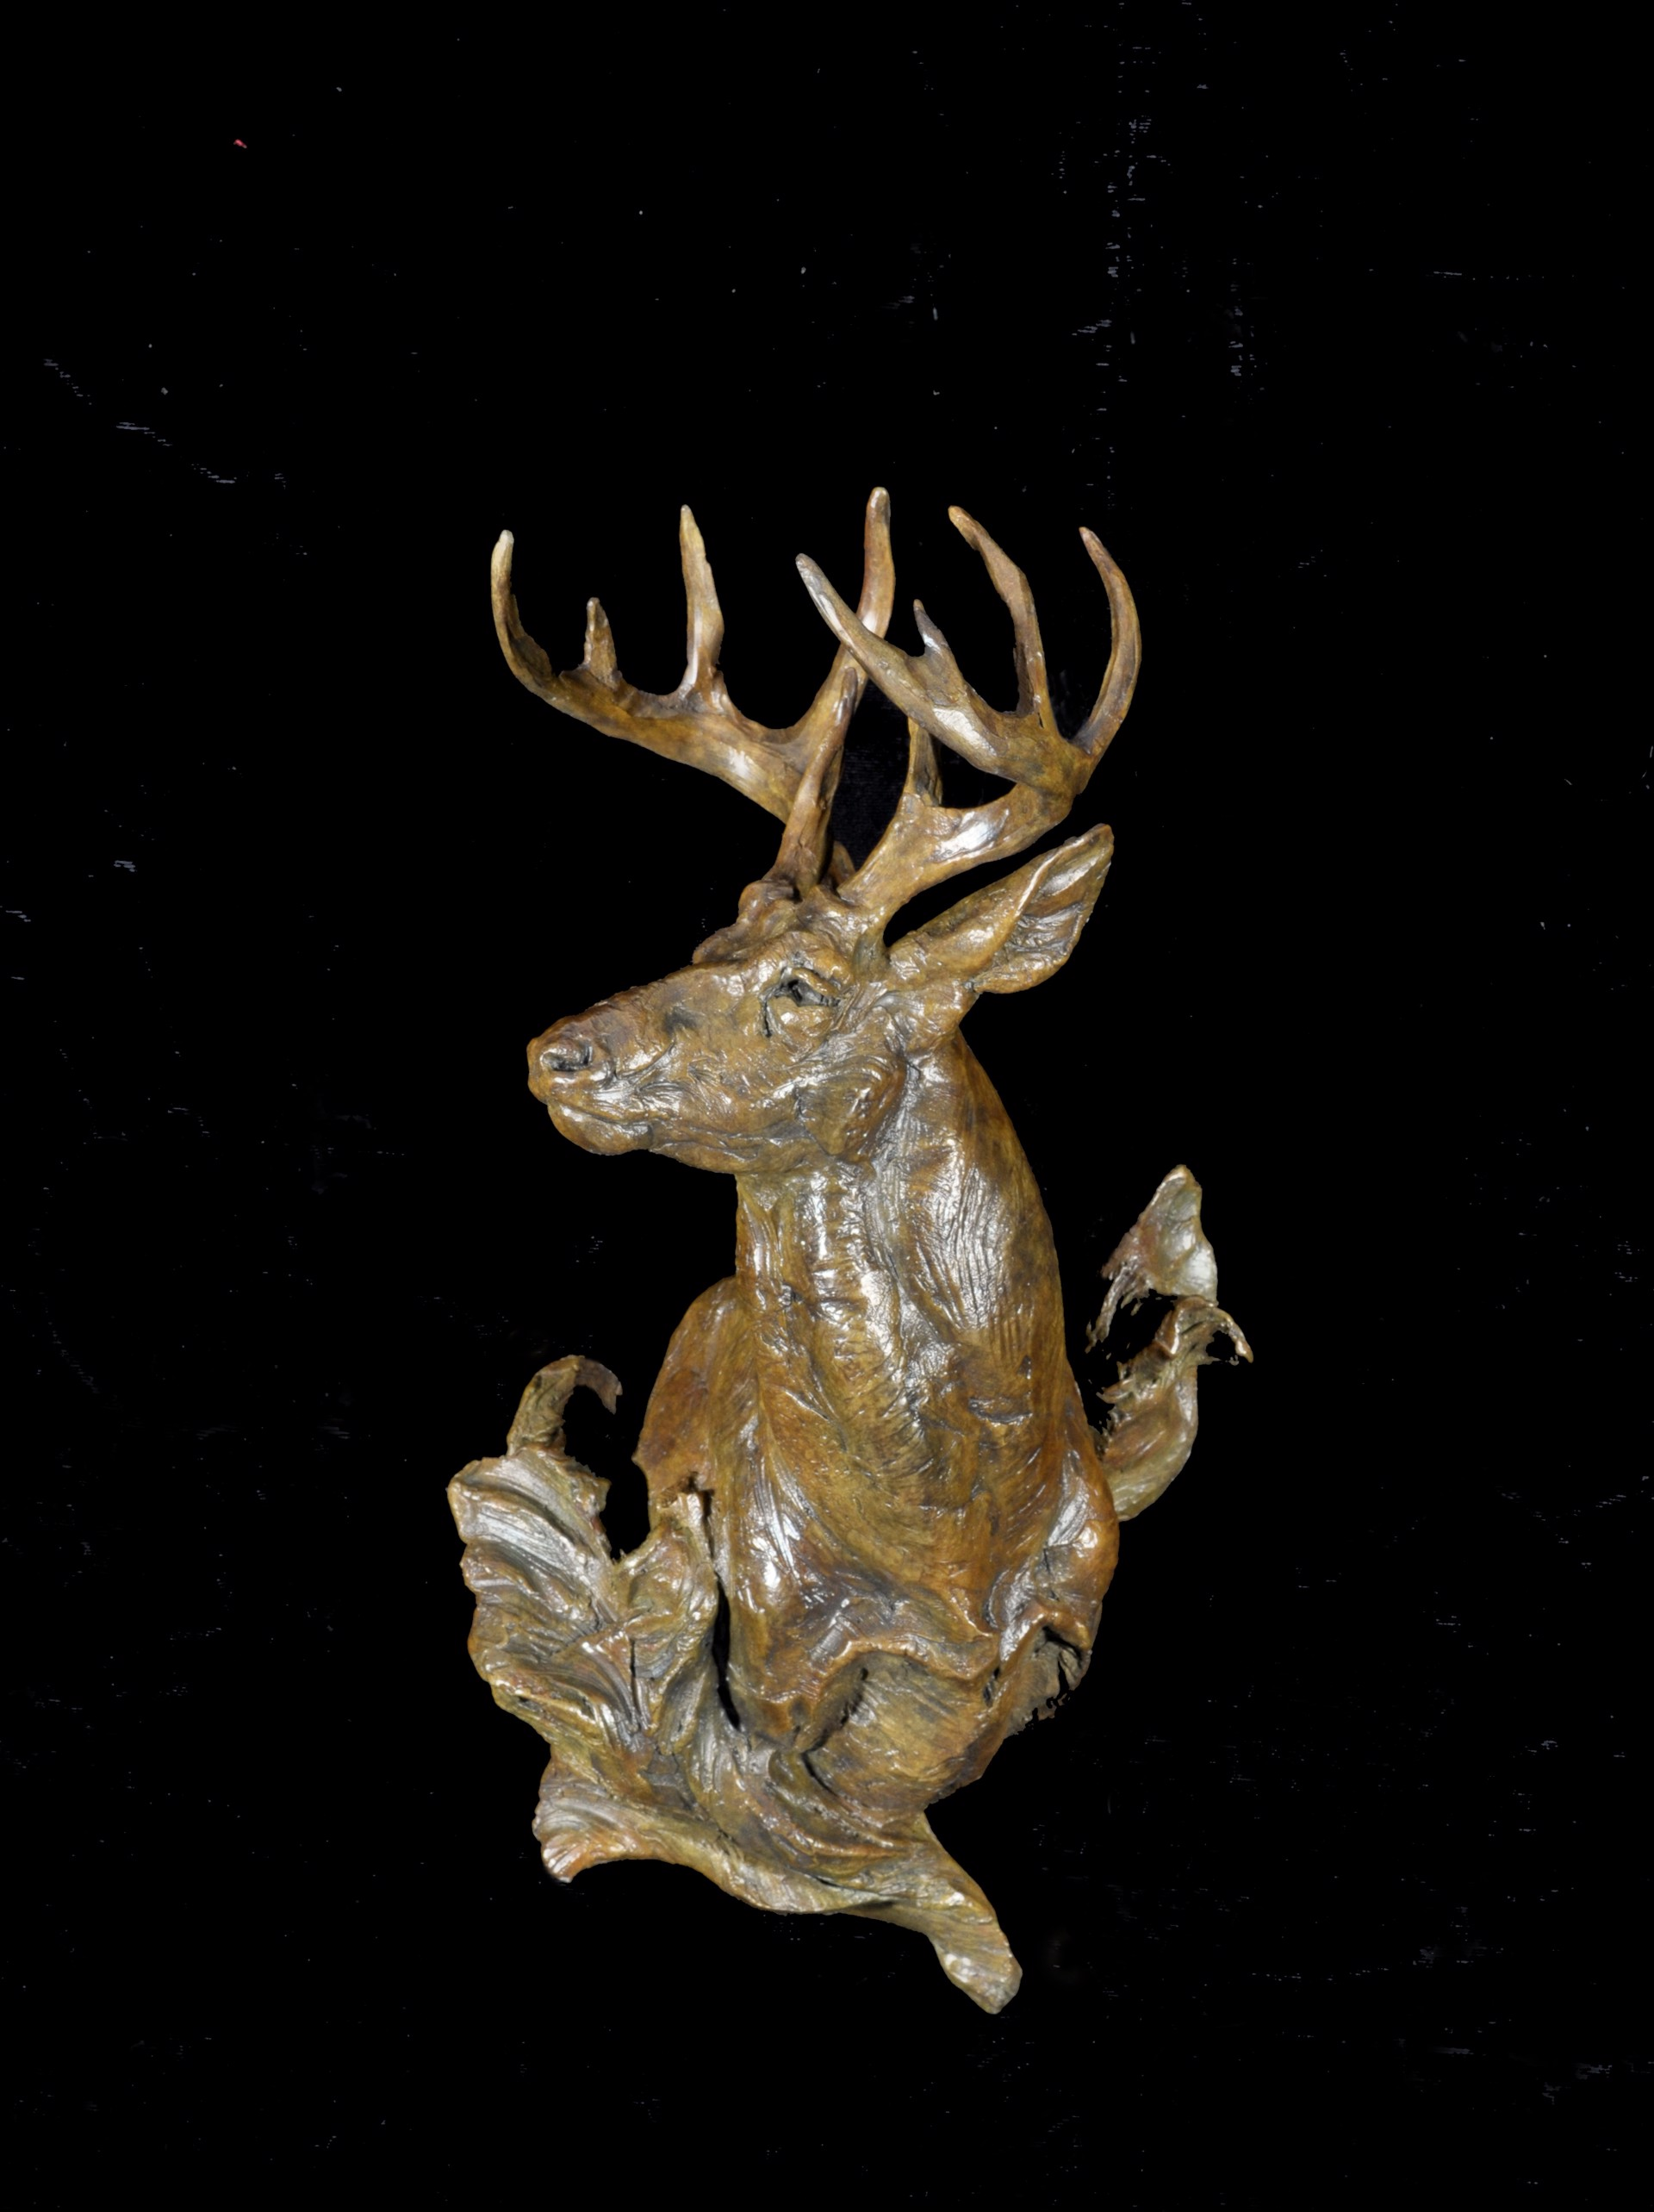 On High Alert (Whitetail Deer) by Tim Shinabarger